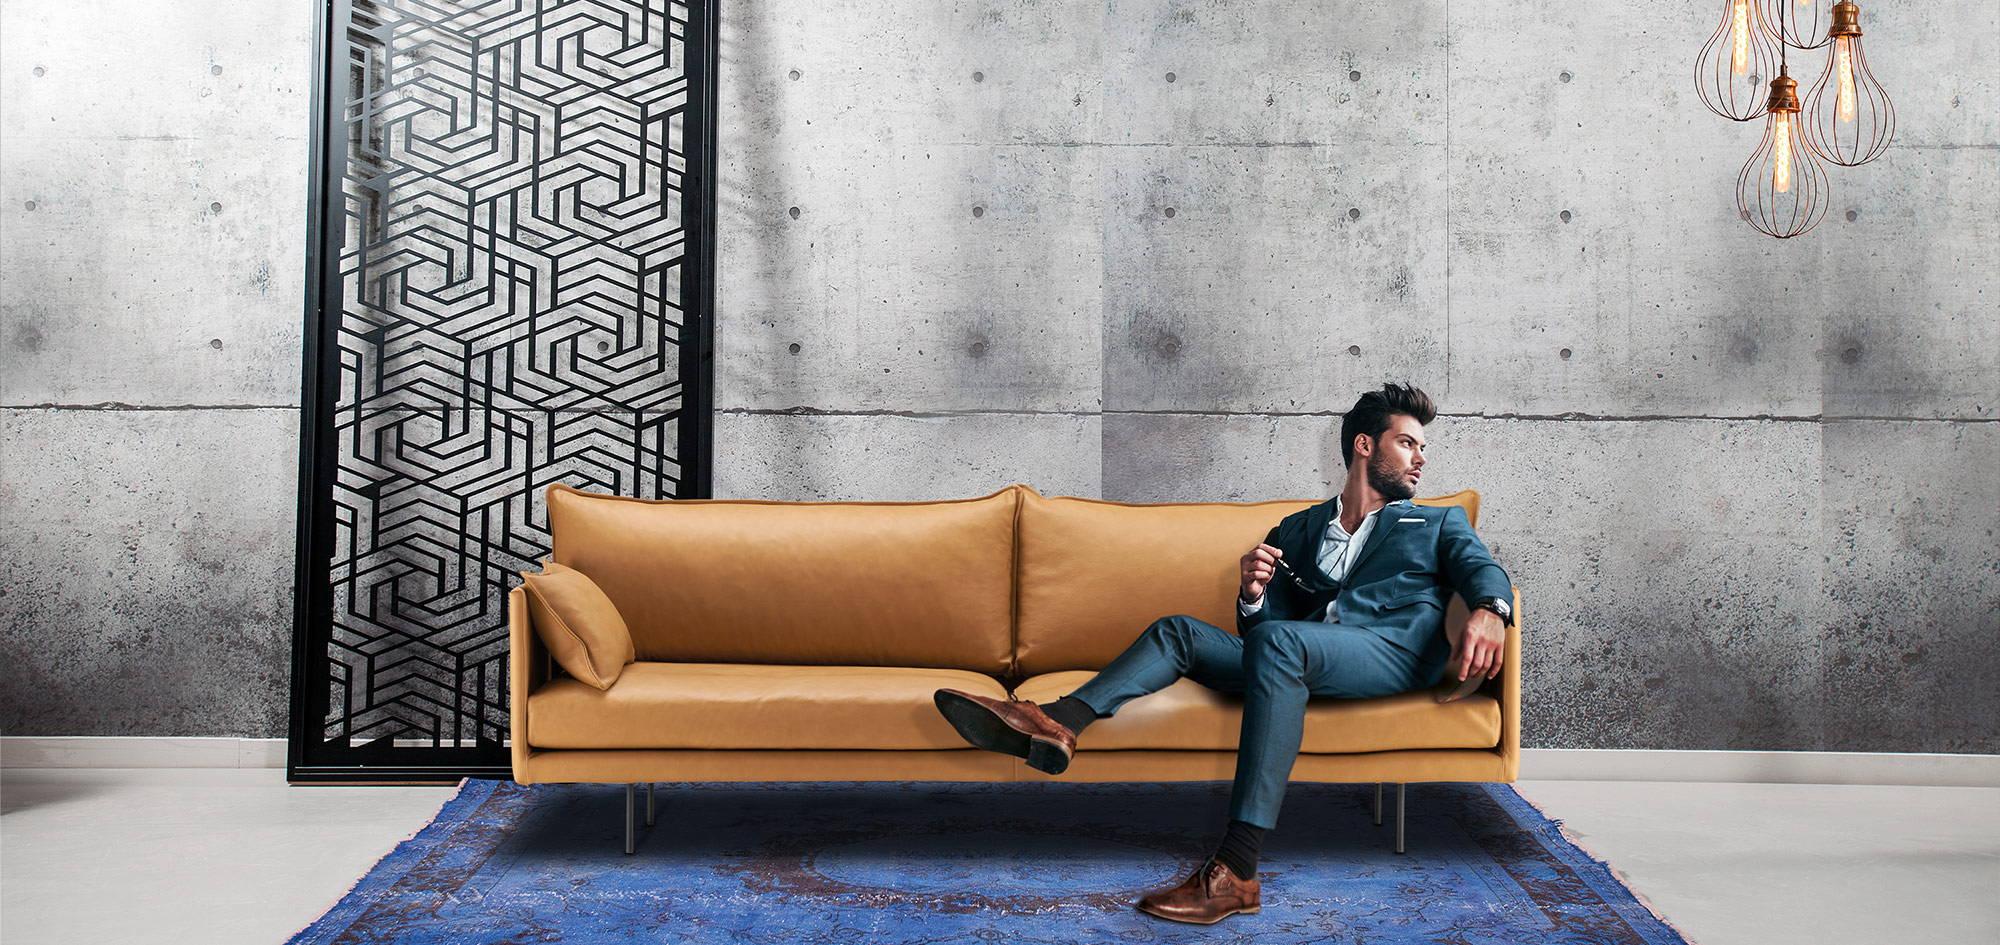 Air-sohva, ruskea nahka, mies istuu sohvalla. HT Collection